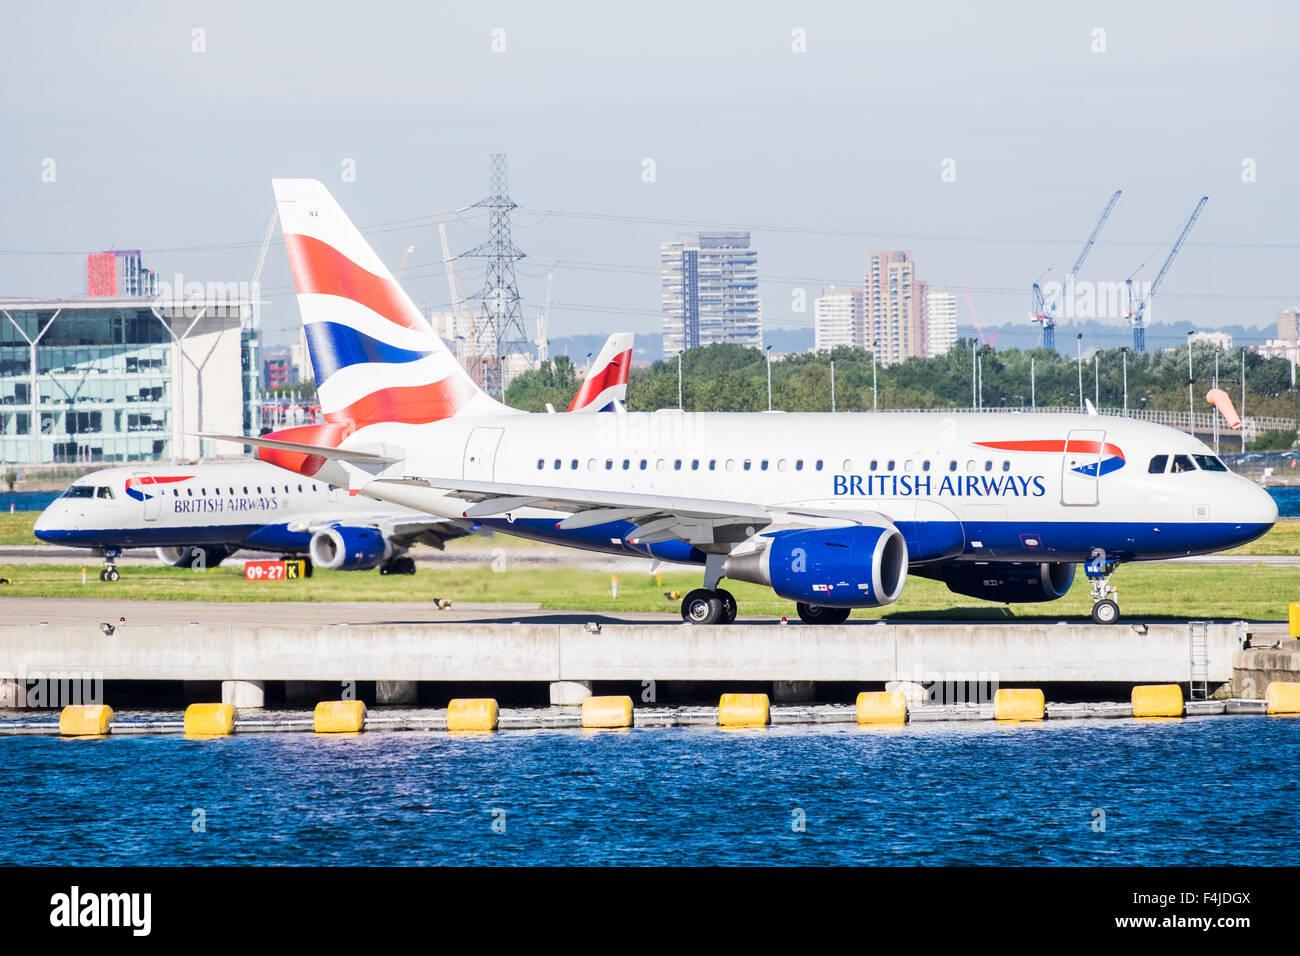 London City Airport aircraft, Docklands, London, England, U.K. - Stock Image